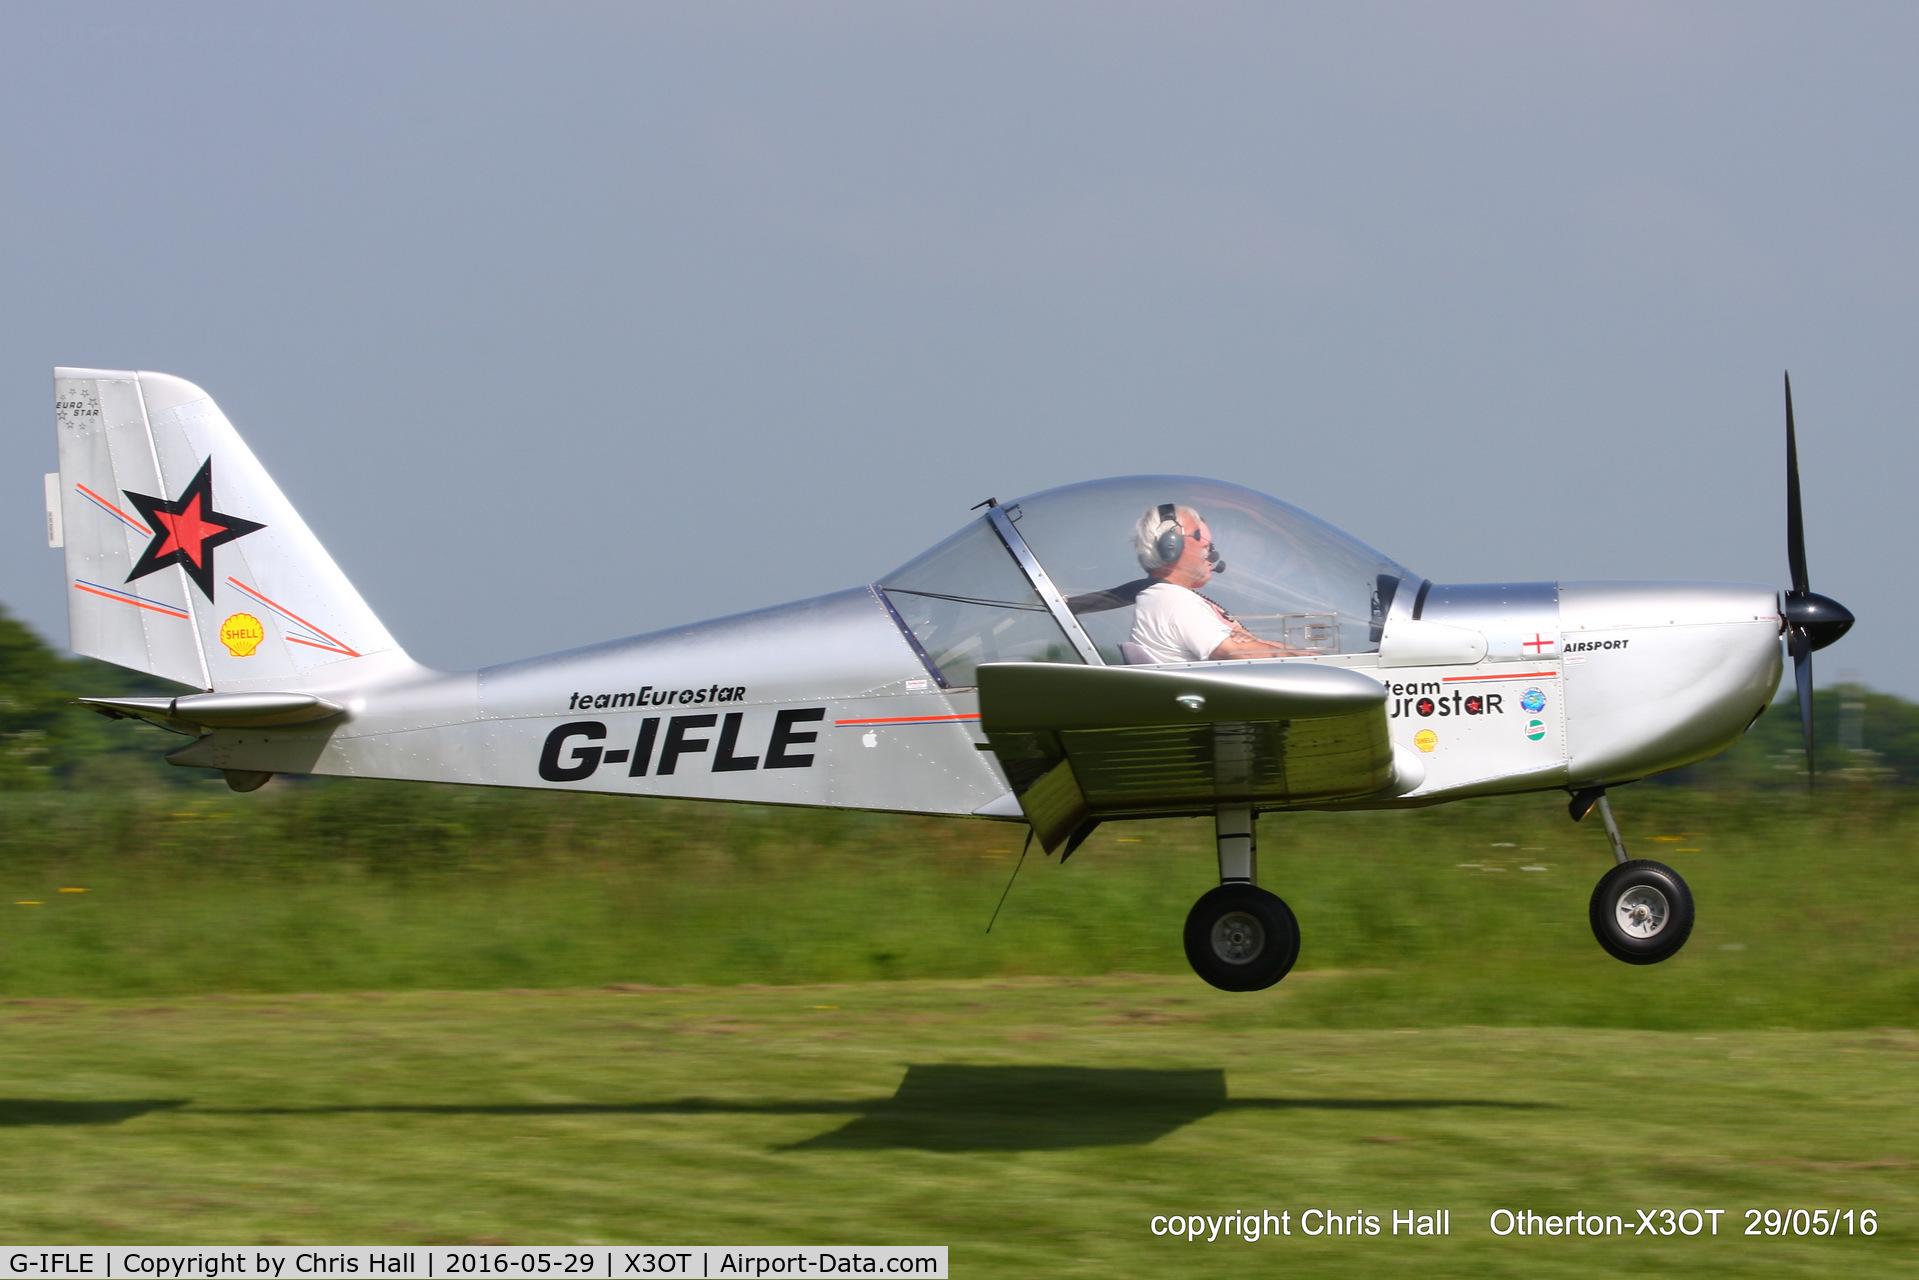 G-IFLE, 2004 Cosmik EV-97 TeamEurostar UK C/N 2113, at Otherton